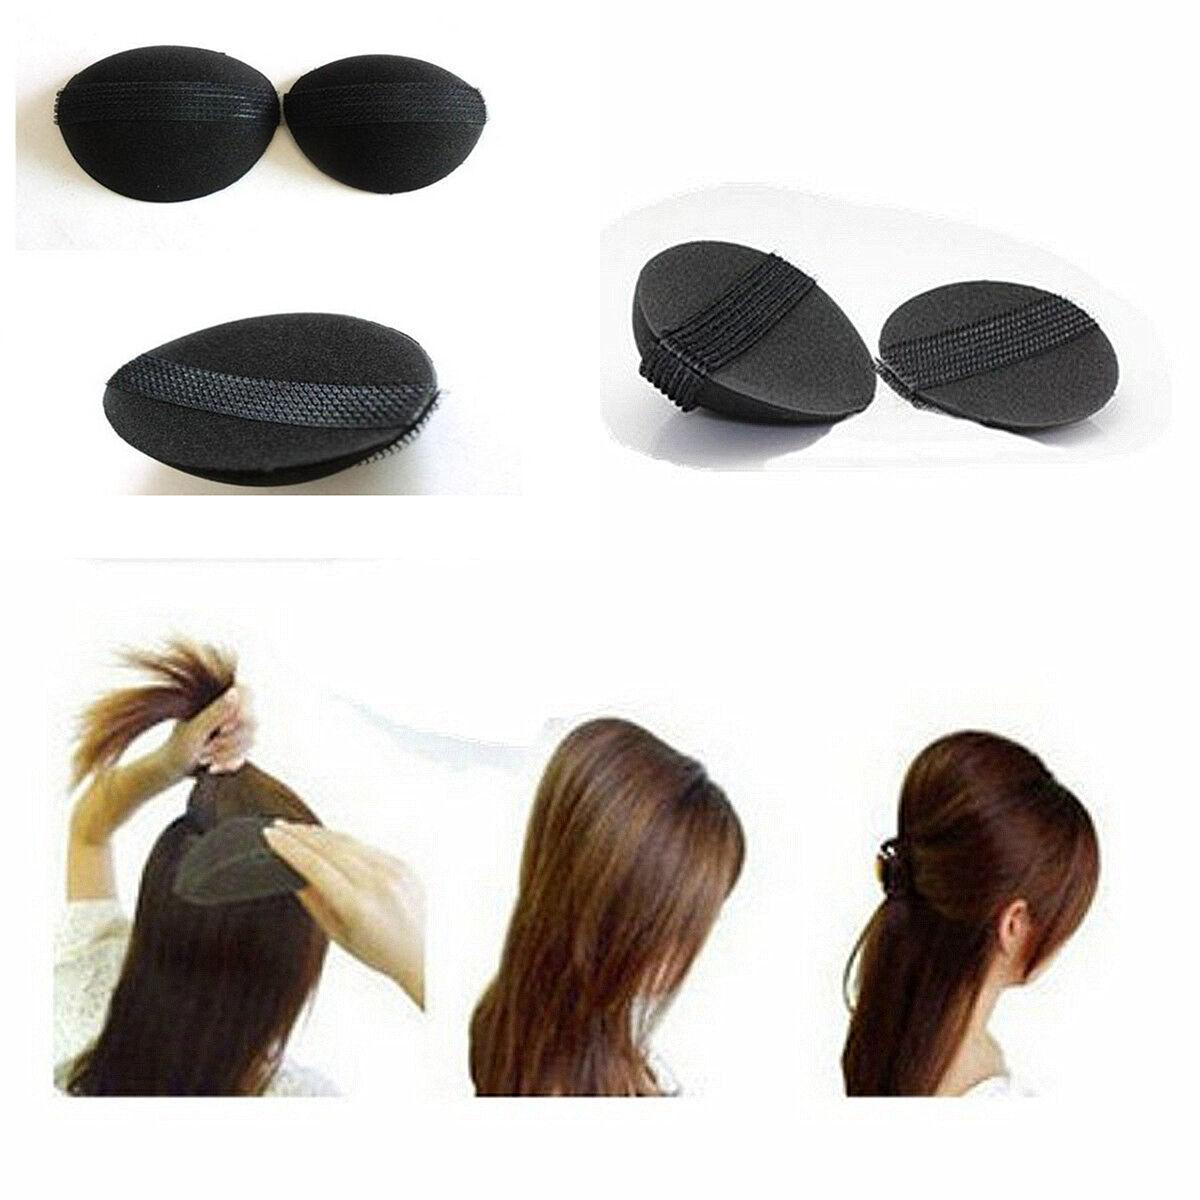 3 Different Sizes Women Volume Hair Base DIY Bump Styling Insert Decoratio